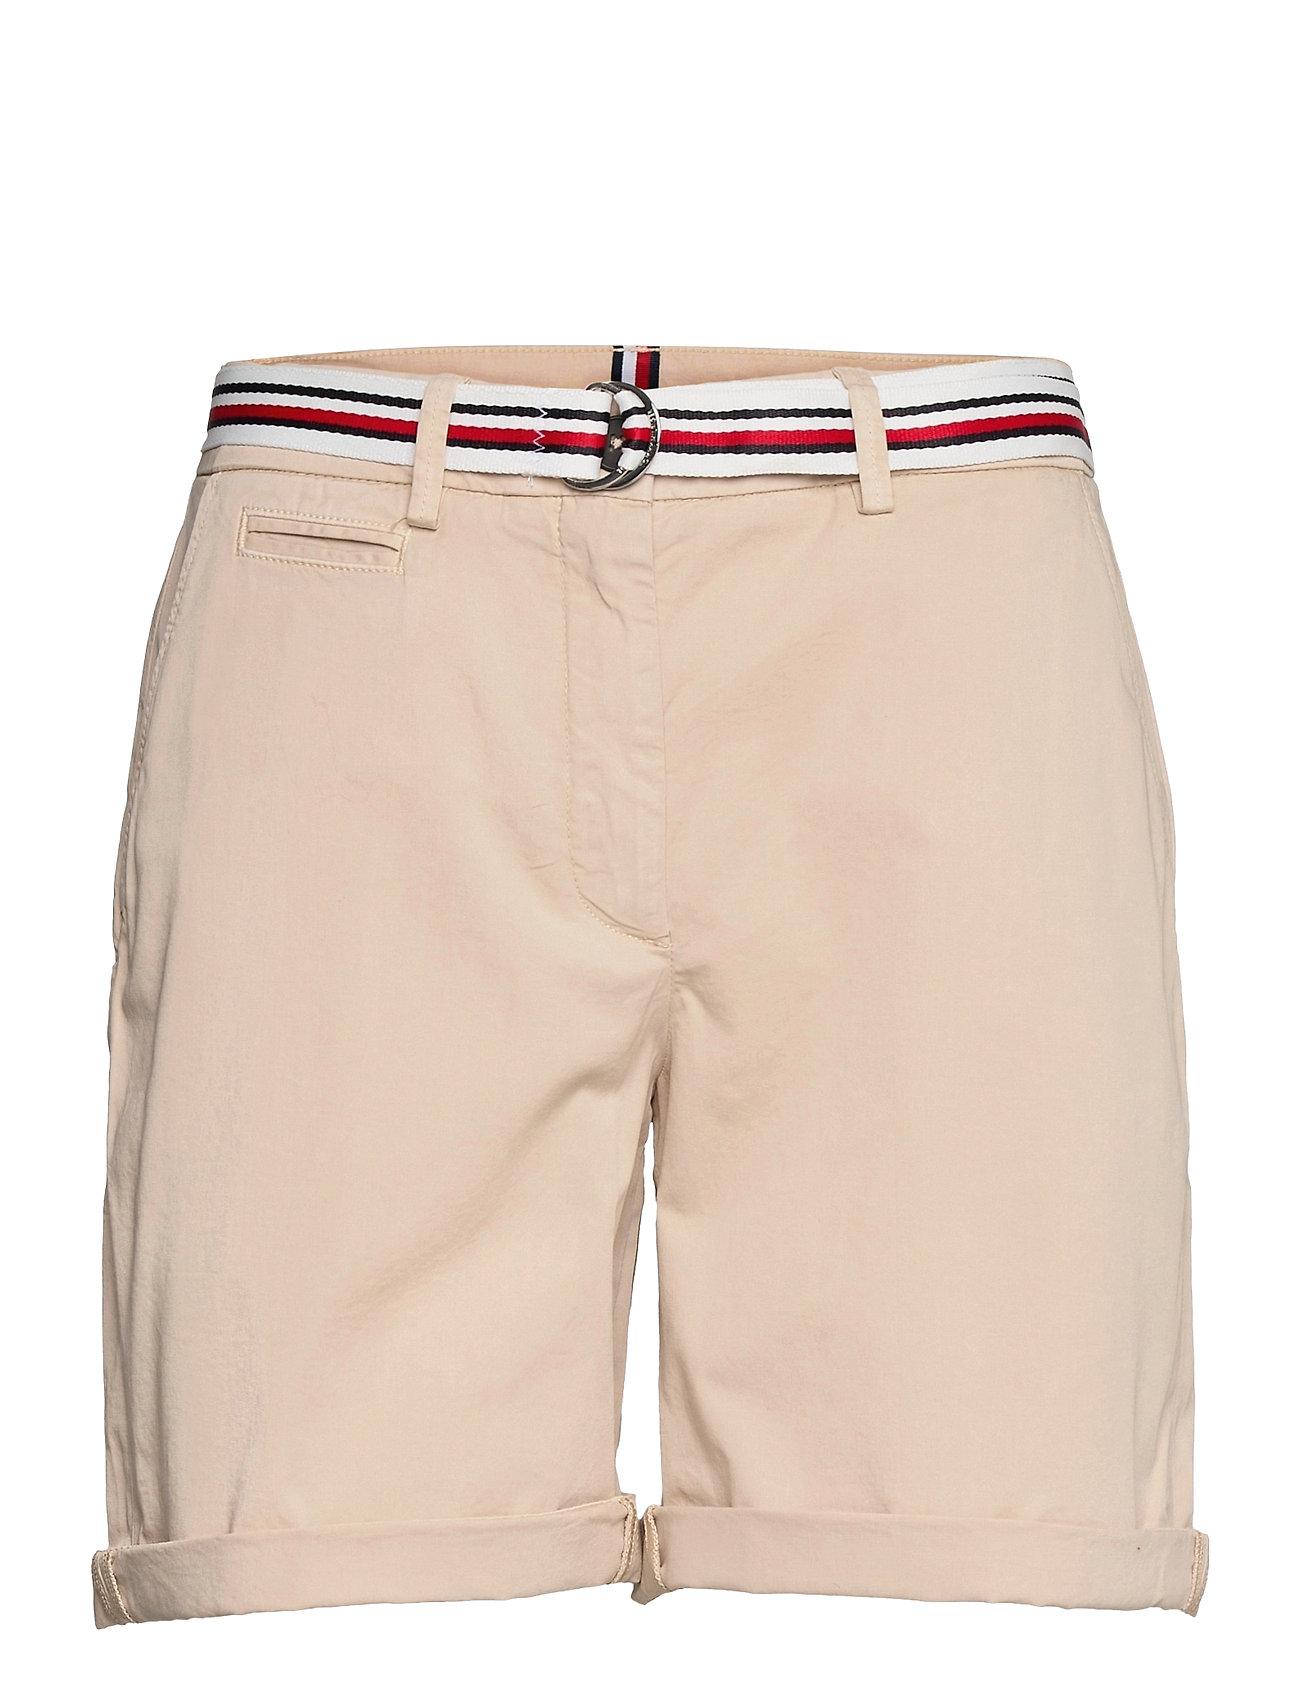 Image of Cotton Tencel Chino Rw Short Shorts Chino Shorts Beige Tommy Hilfiger (3507965171)